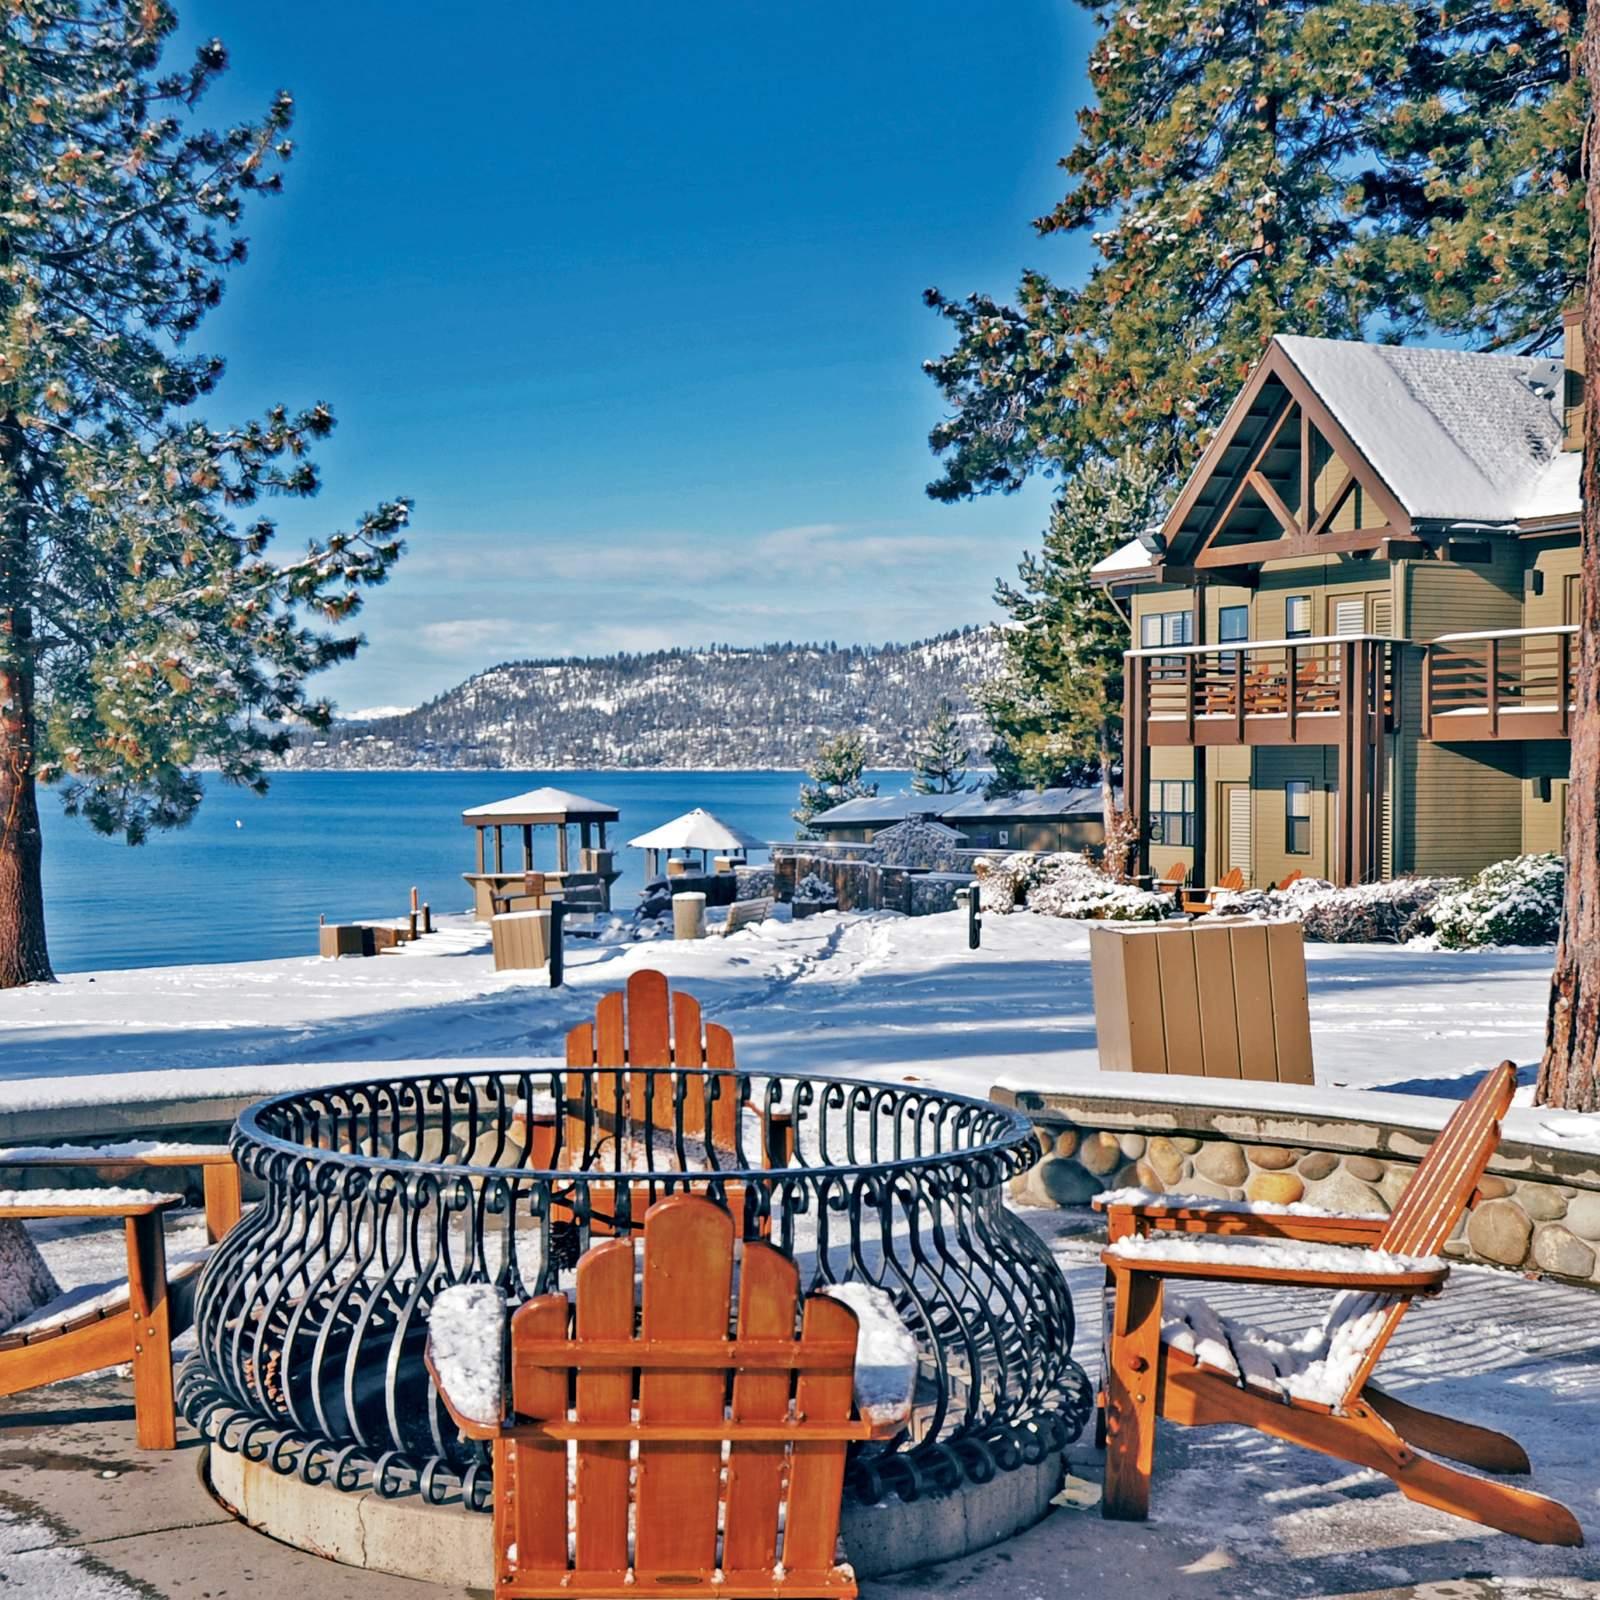 Hotel kalifornien hyatt regency lake tahoe resort spa for Hyatt lake cabins